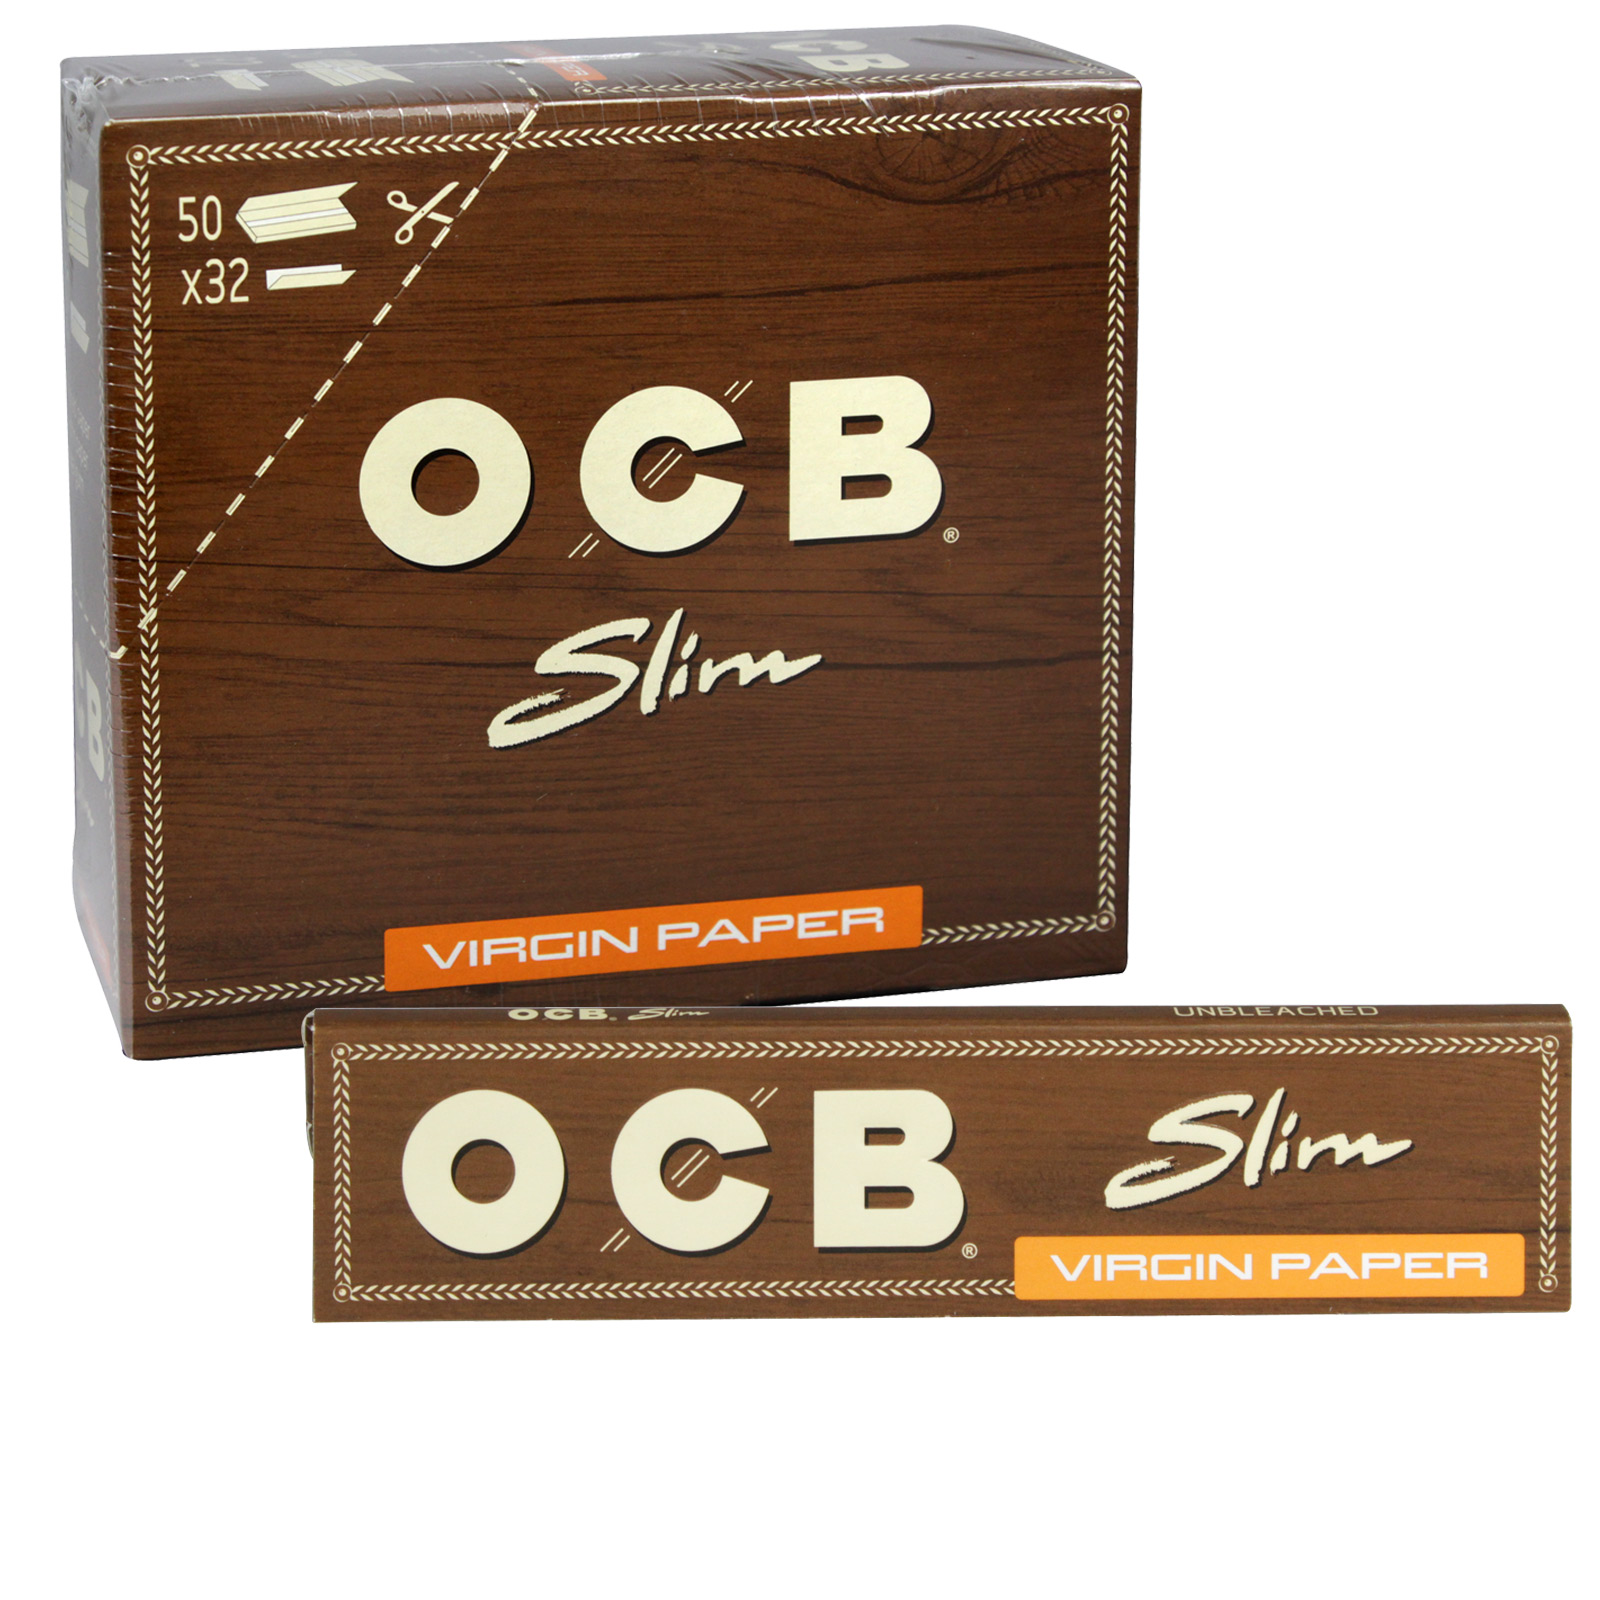 OCB VIRGIN CIGARETTE PAPERS 32S SLIM X50